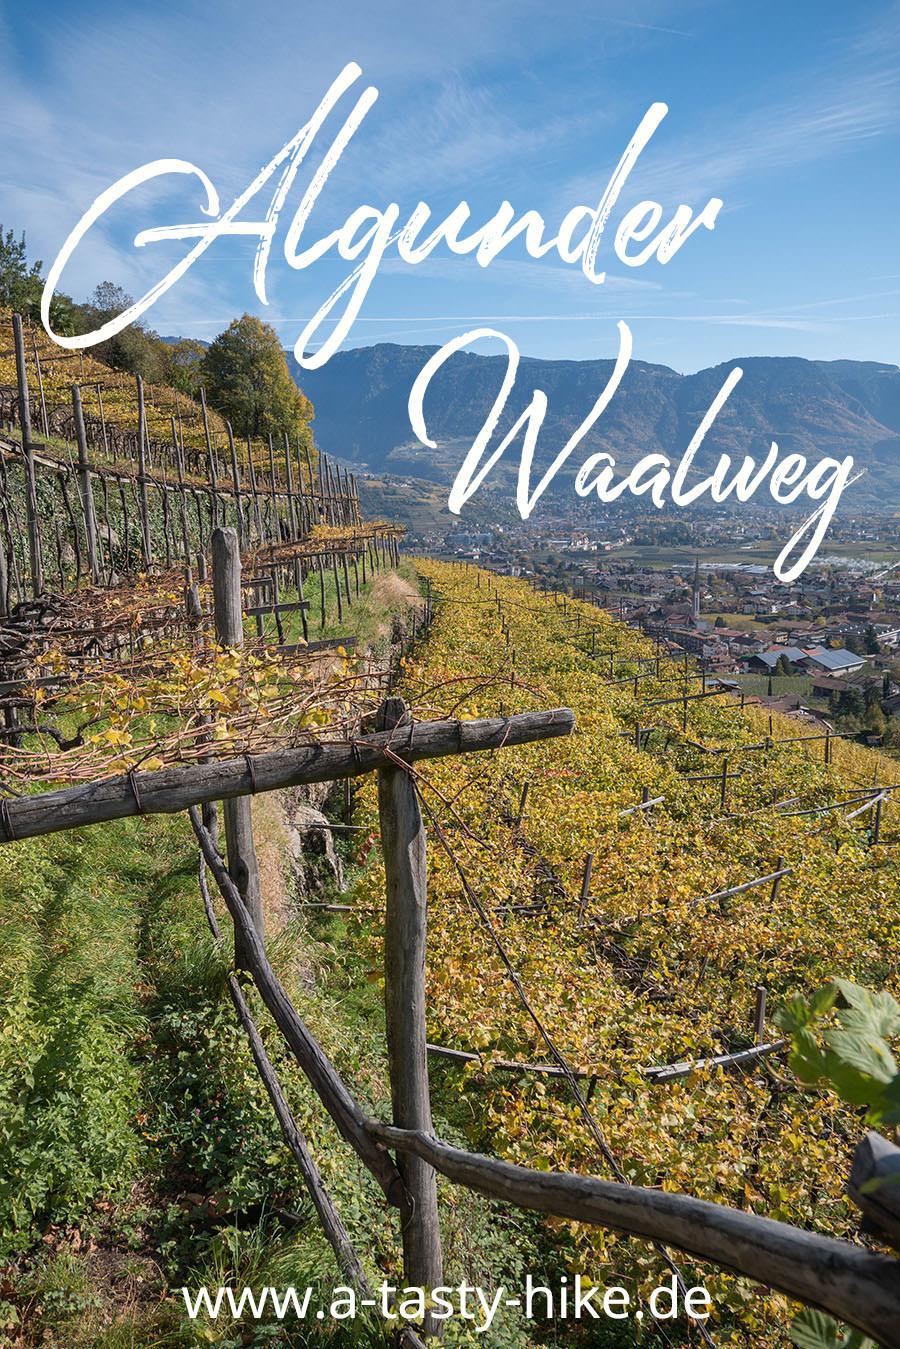 A Tasty Hike - Wandern Algunder Waalweg - Pinterest